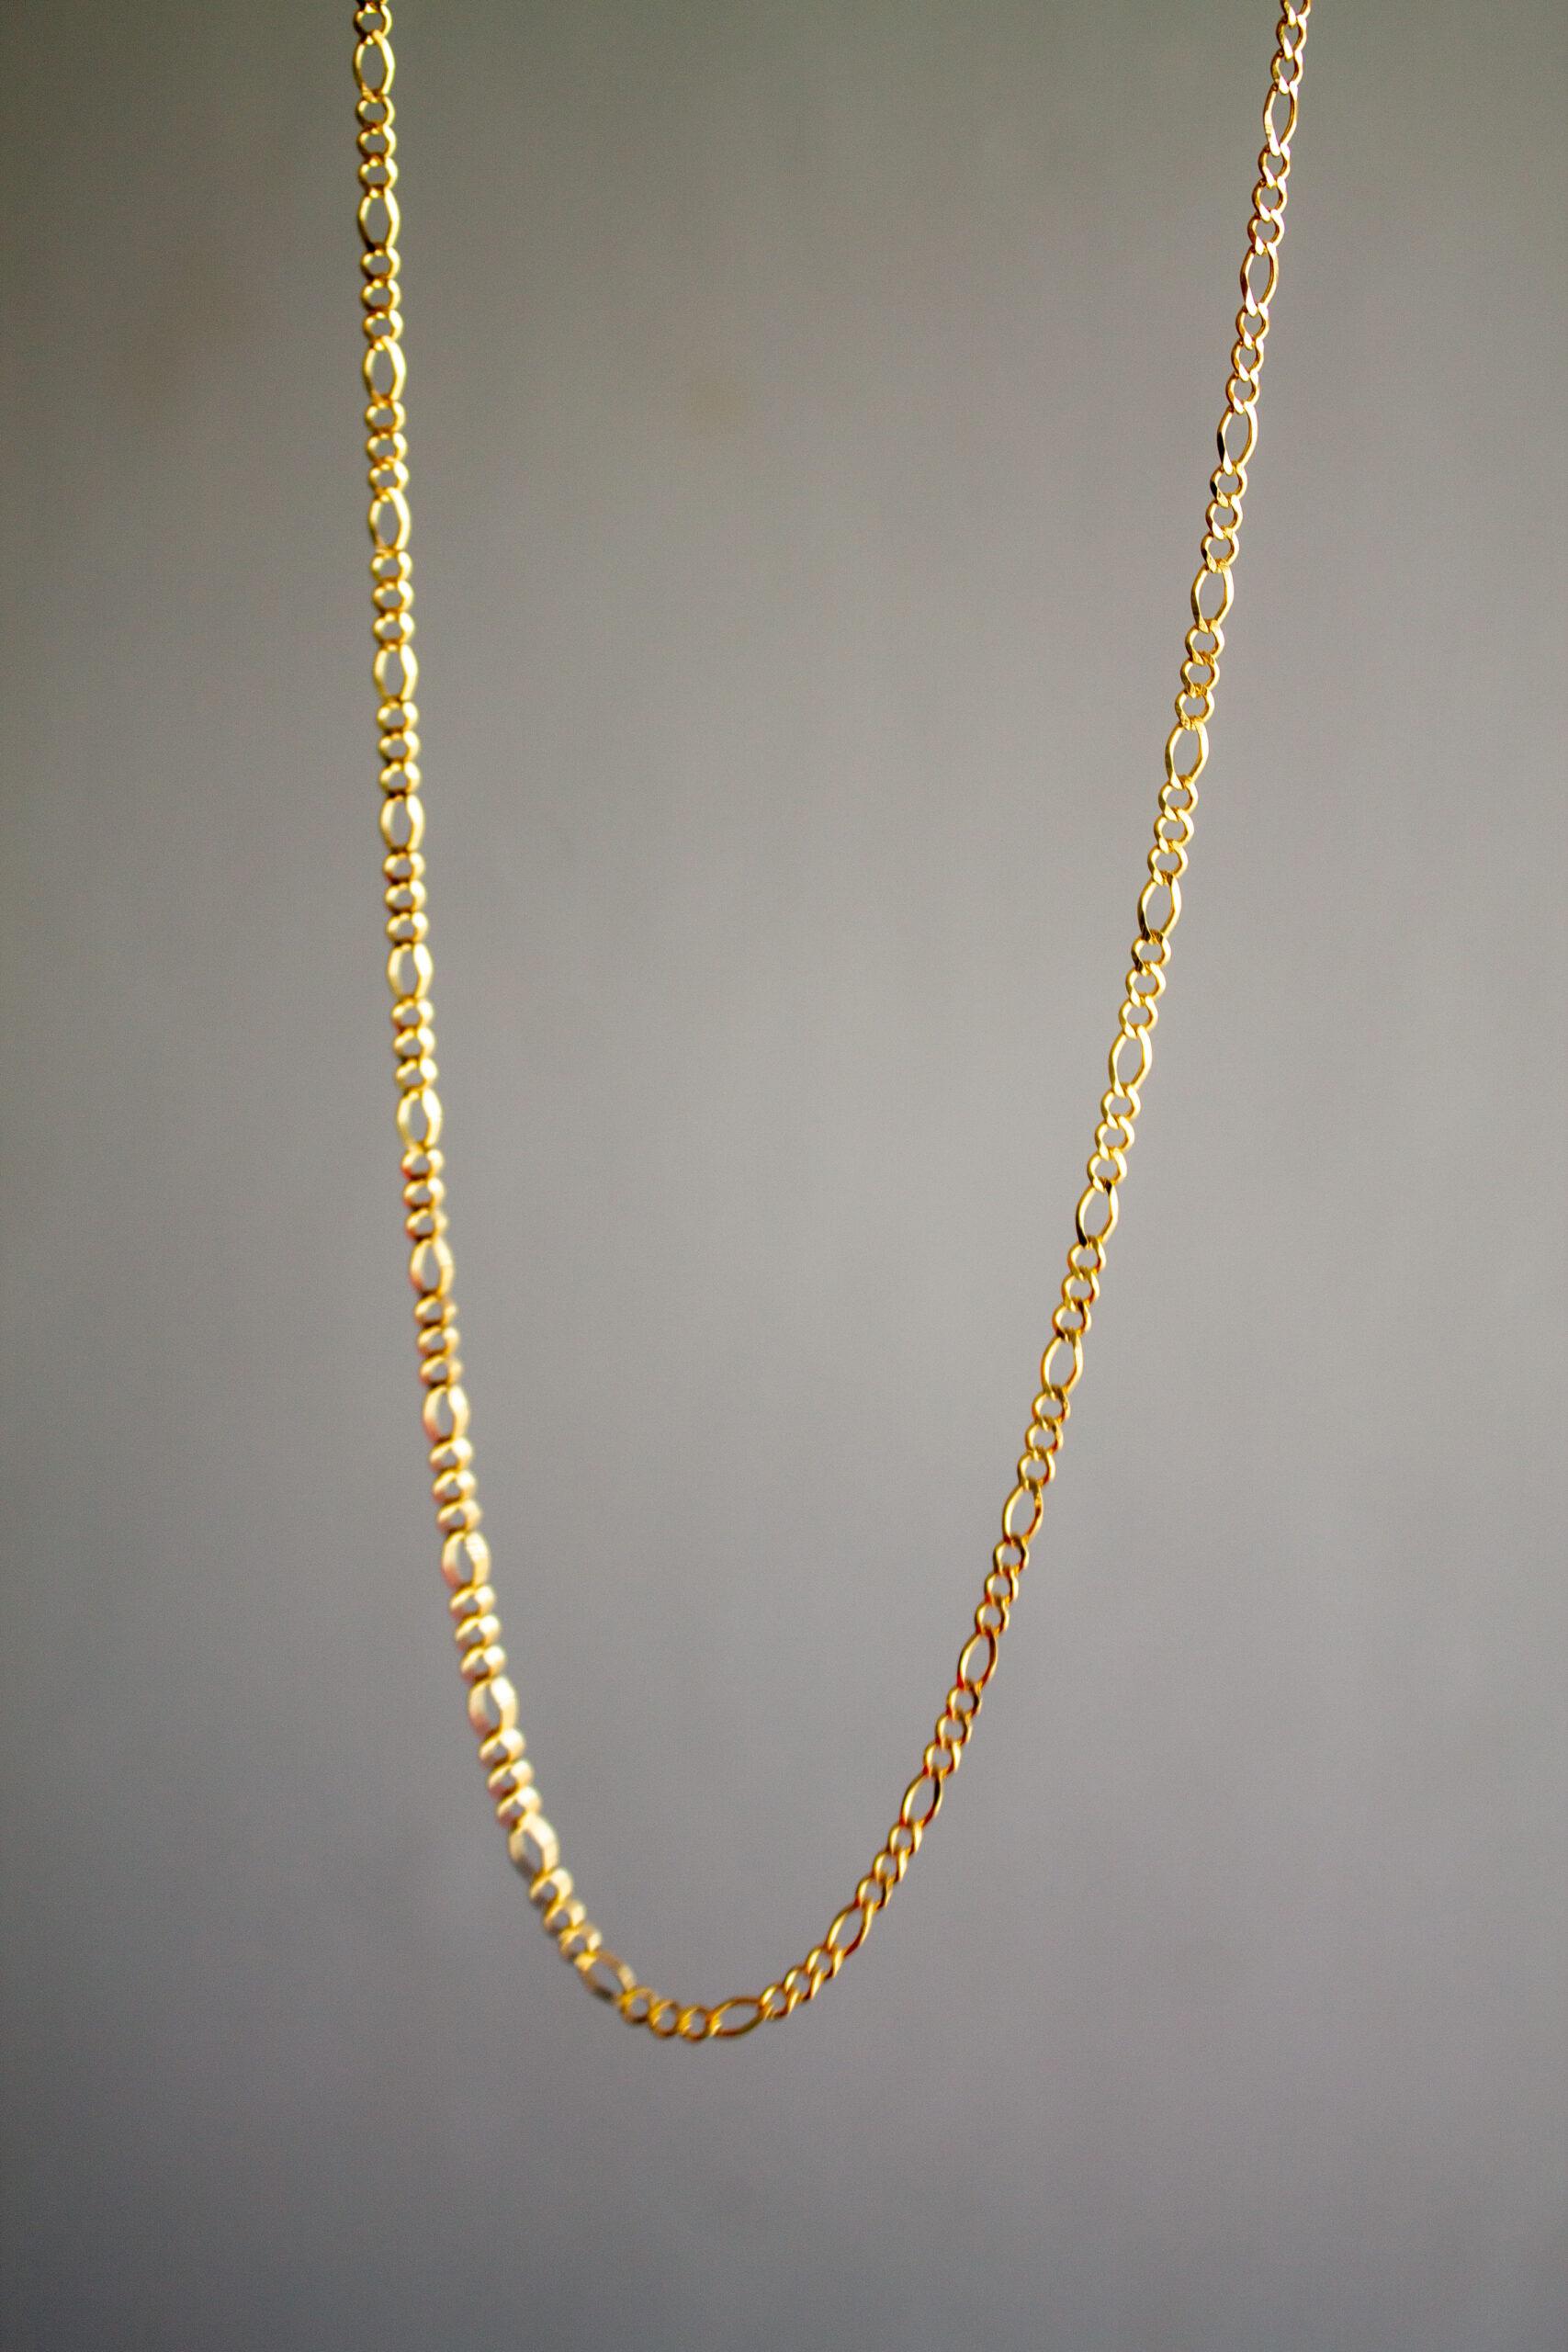 cadena de oro 14 kilates